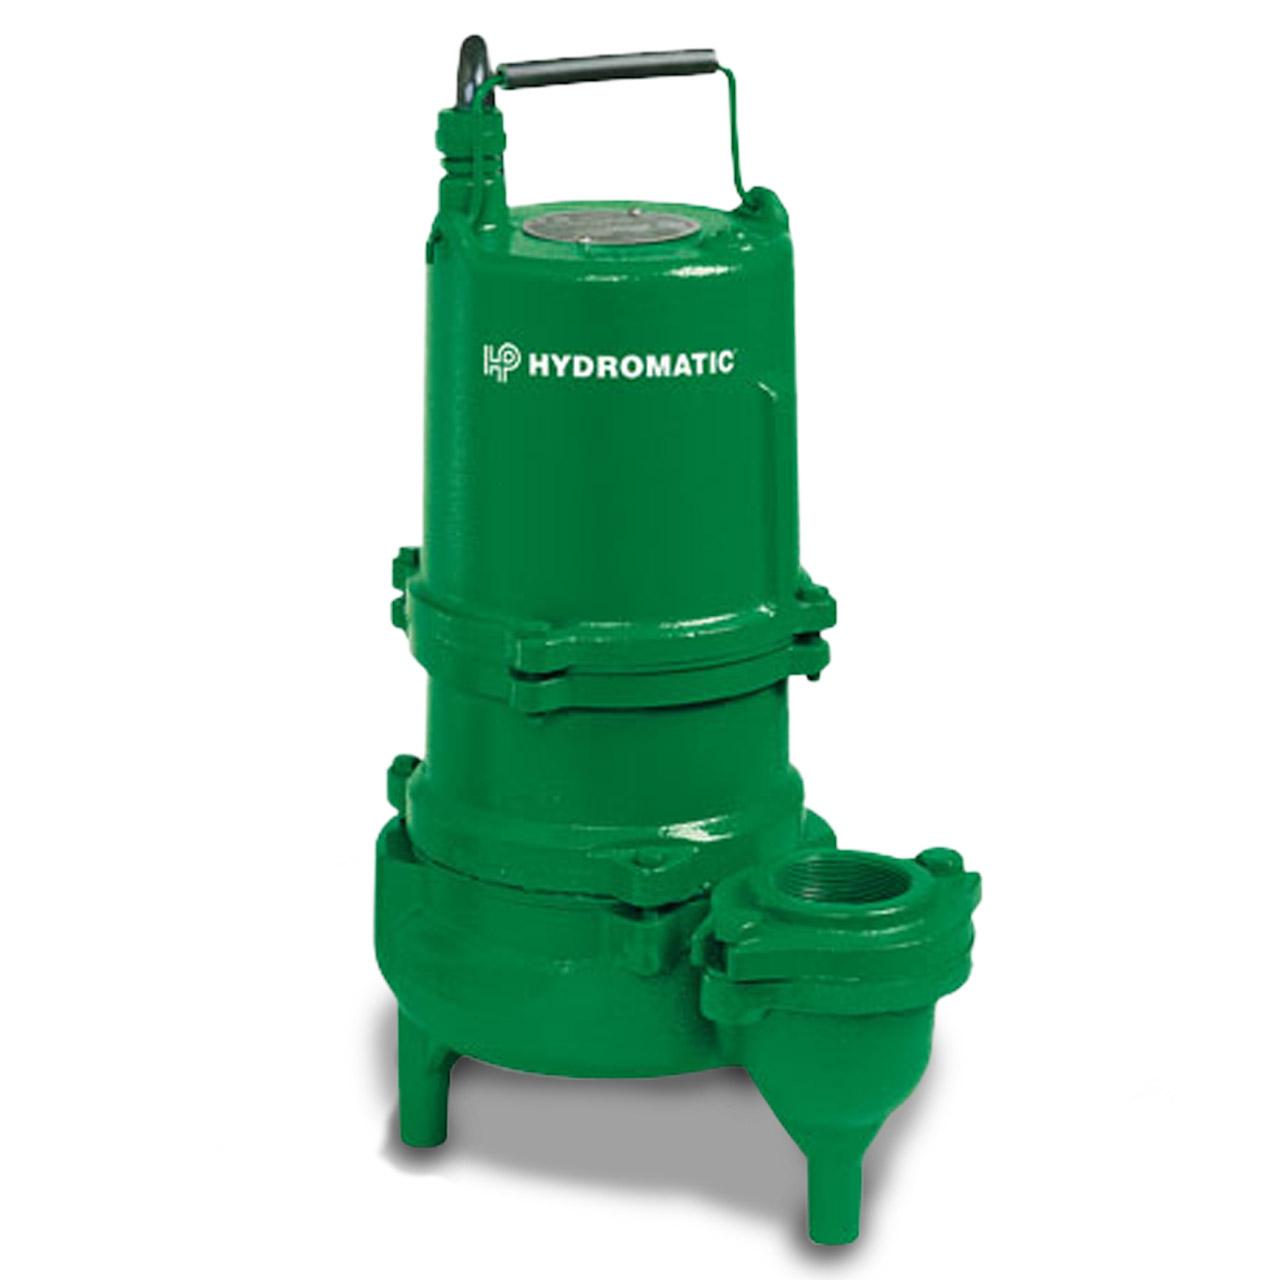 Hydromatic Pump Hydromatic Skhs200m2 Submersible Sewage